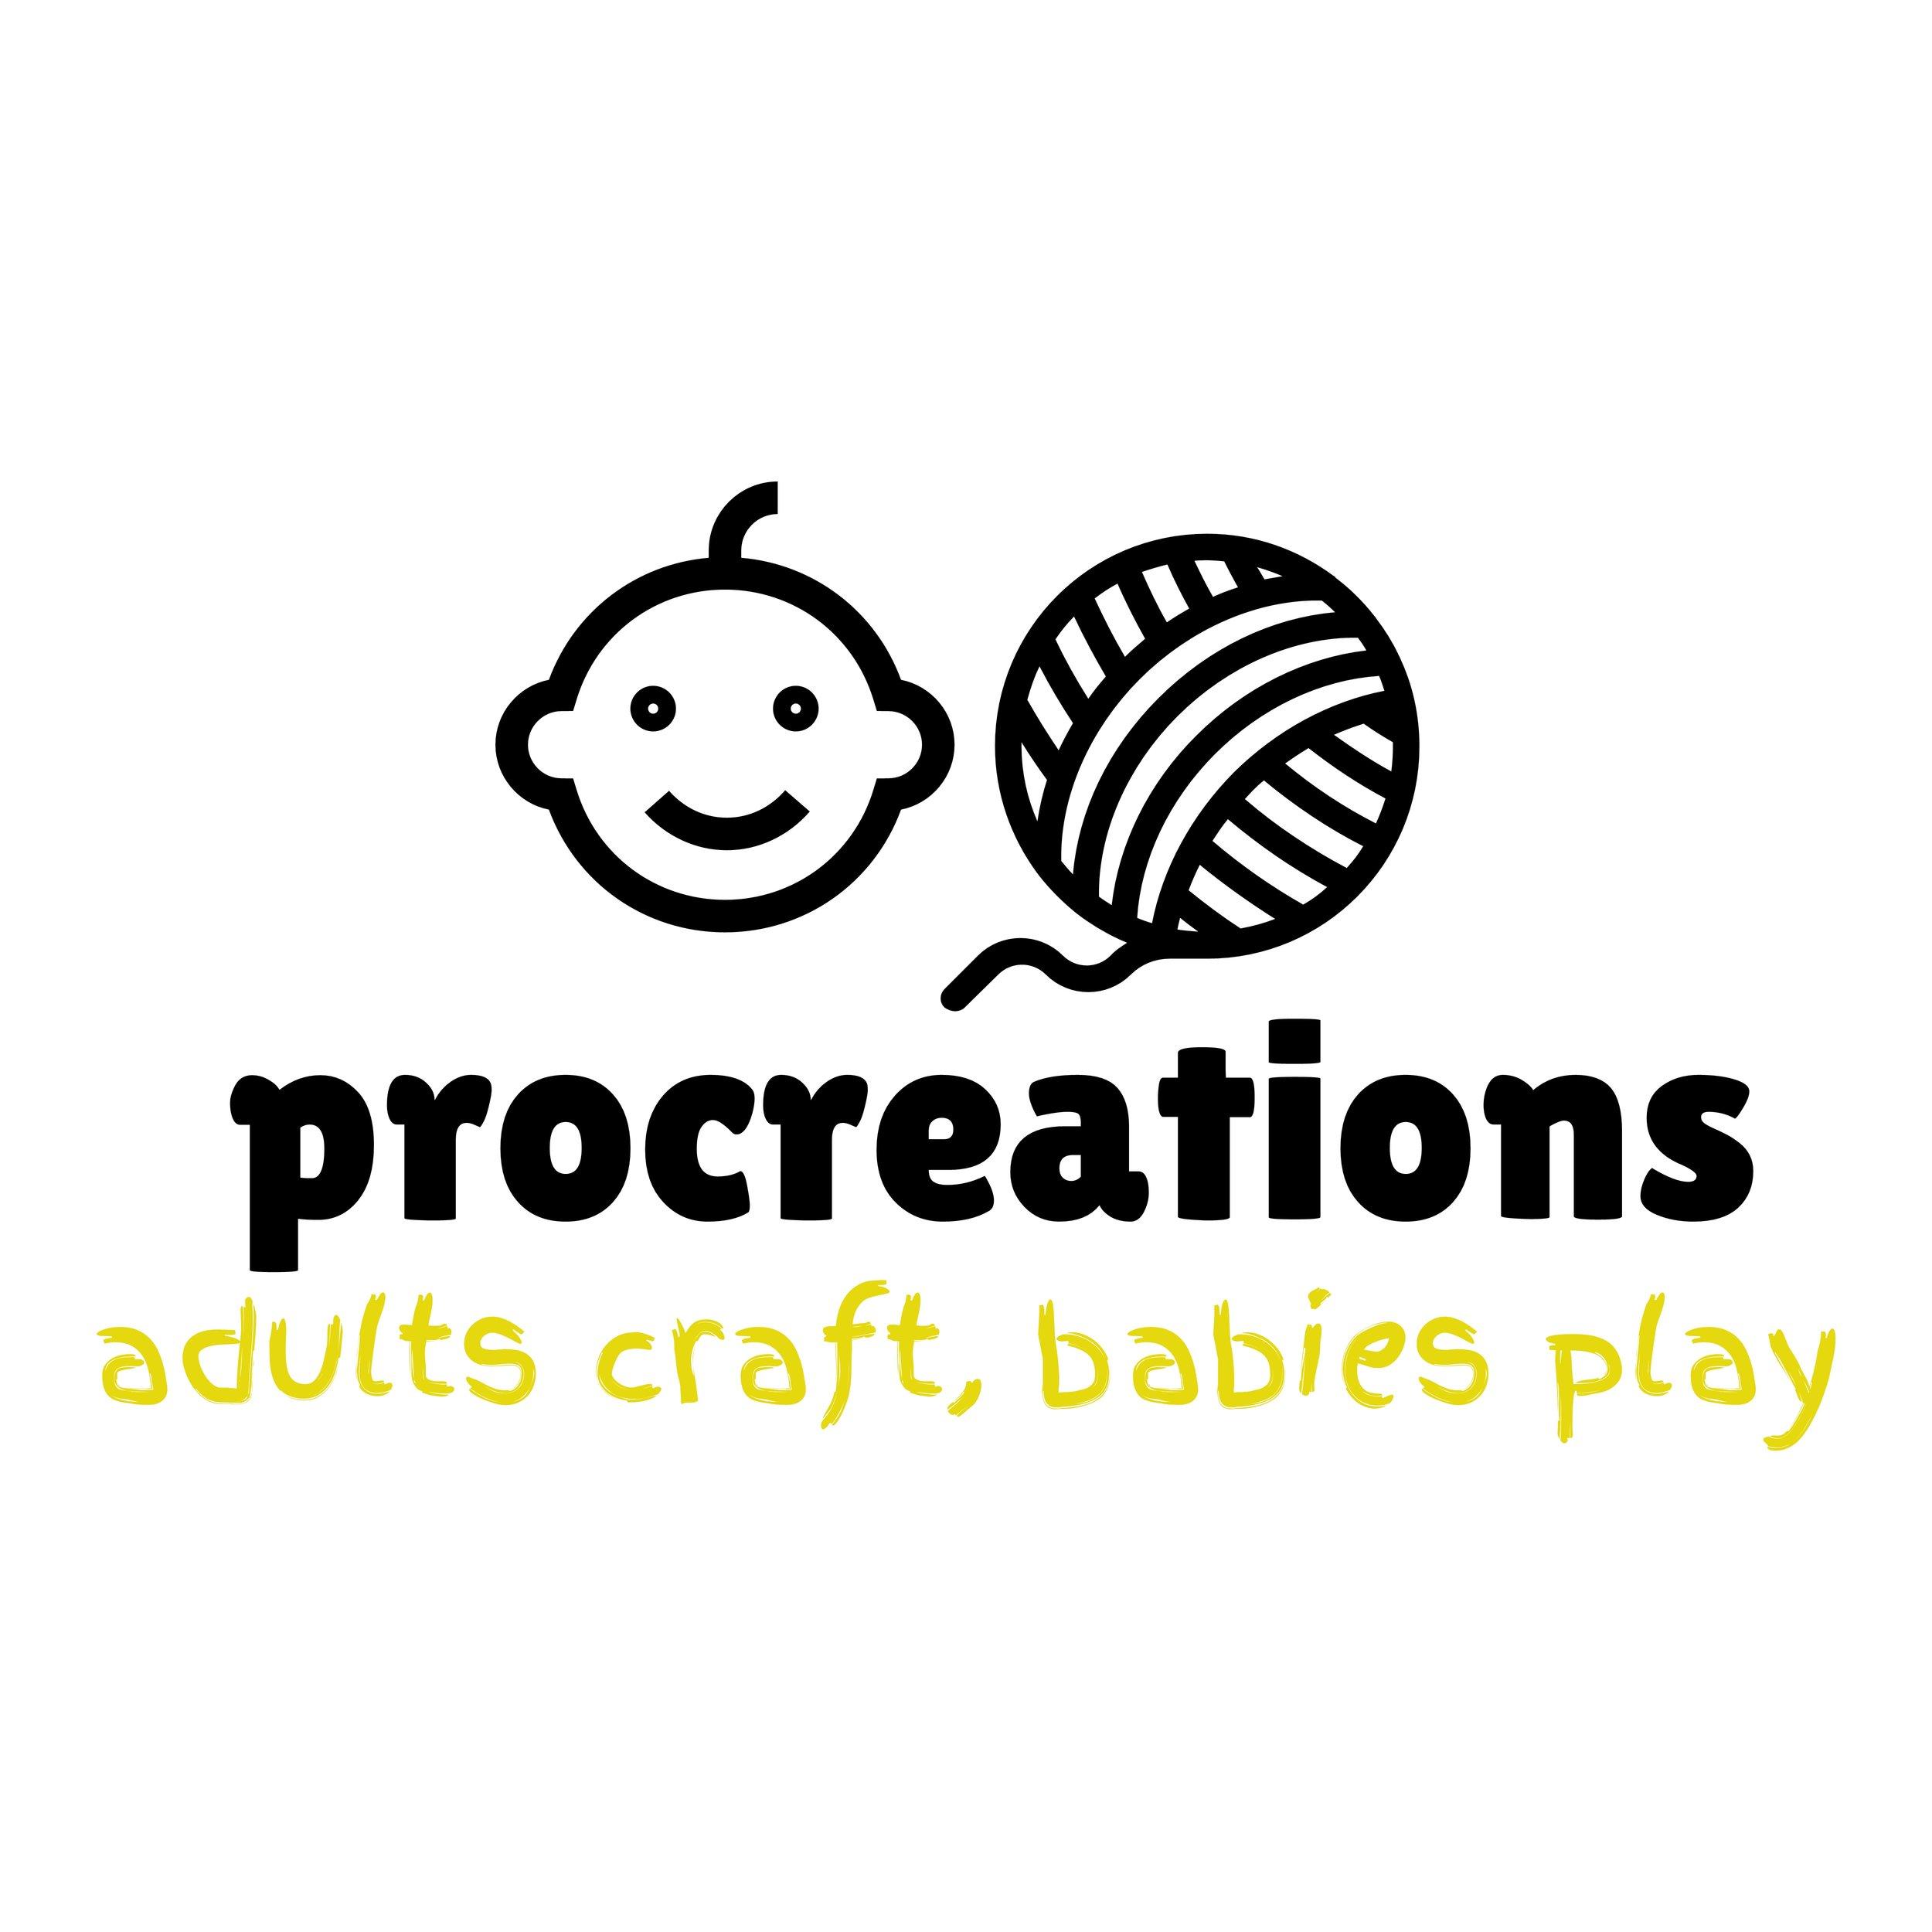 Procreations high-res.jpg